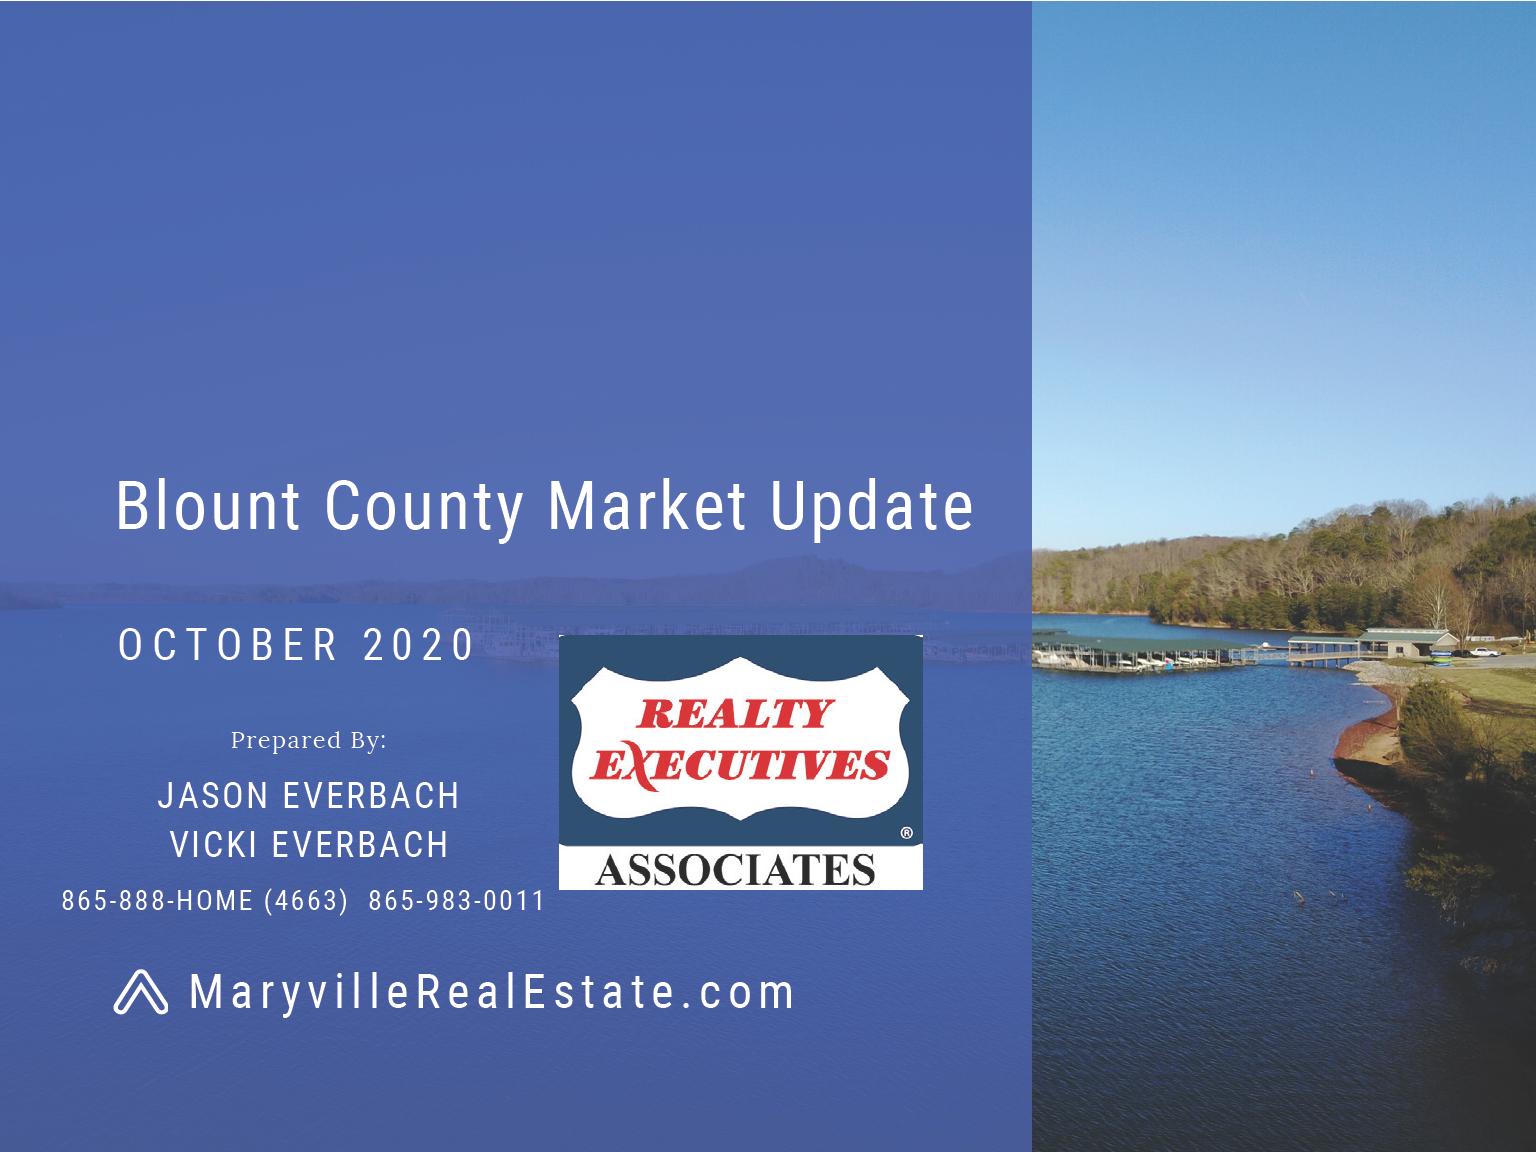 October 2020 Blount County Maryville Real Estate Market Update